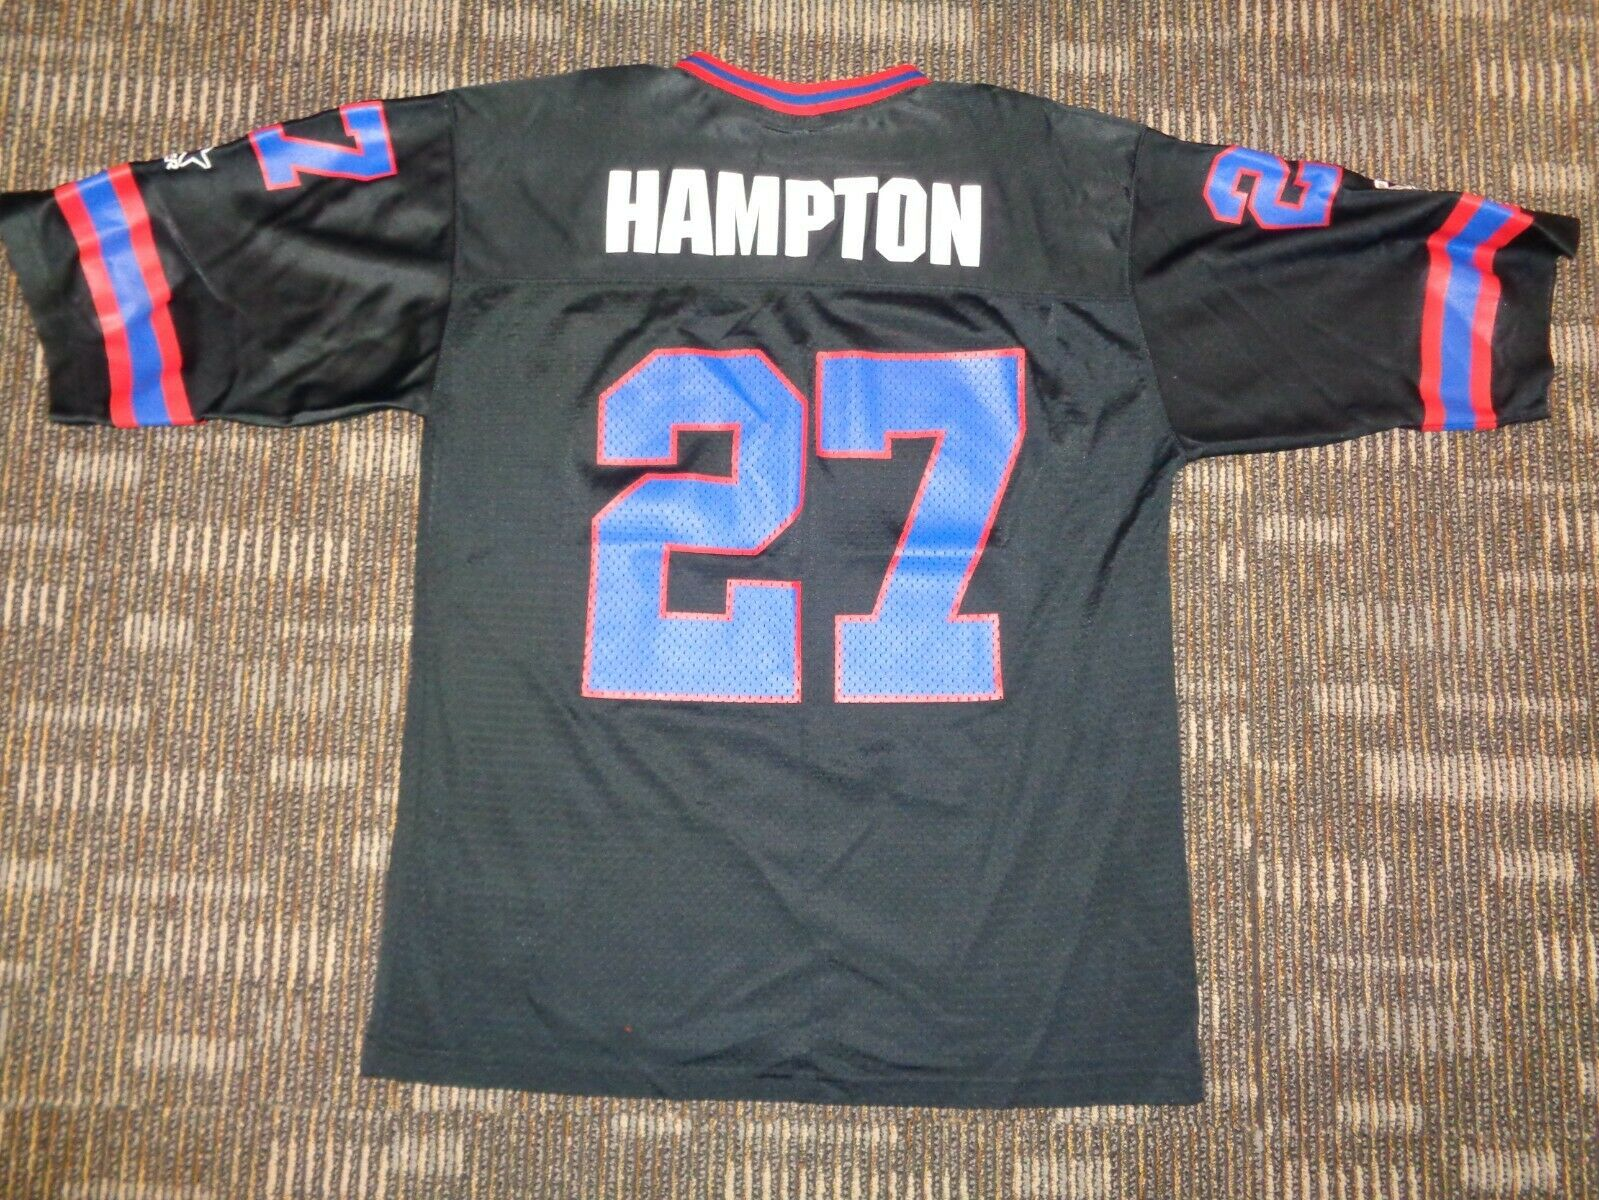 RODNEY HAMPTON 27 NY NEW YORK GIANTS STARTER BLACK NFL GAME FOOTBALL JERSEY LG - $29.99